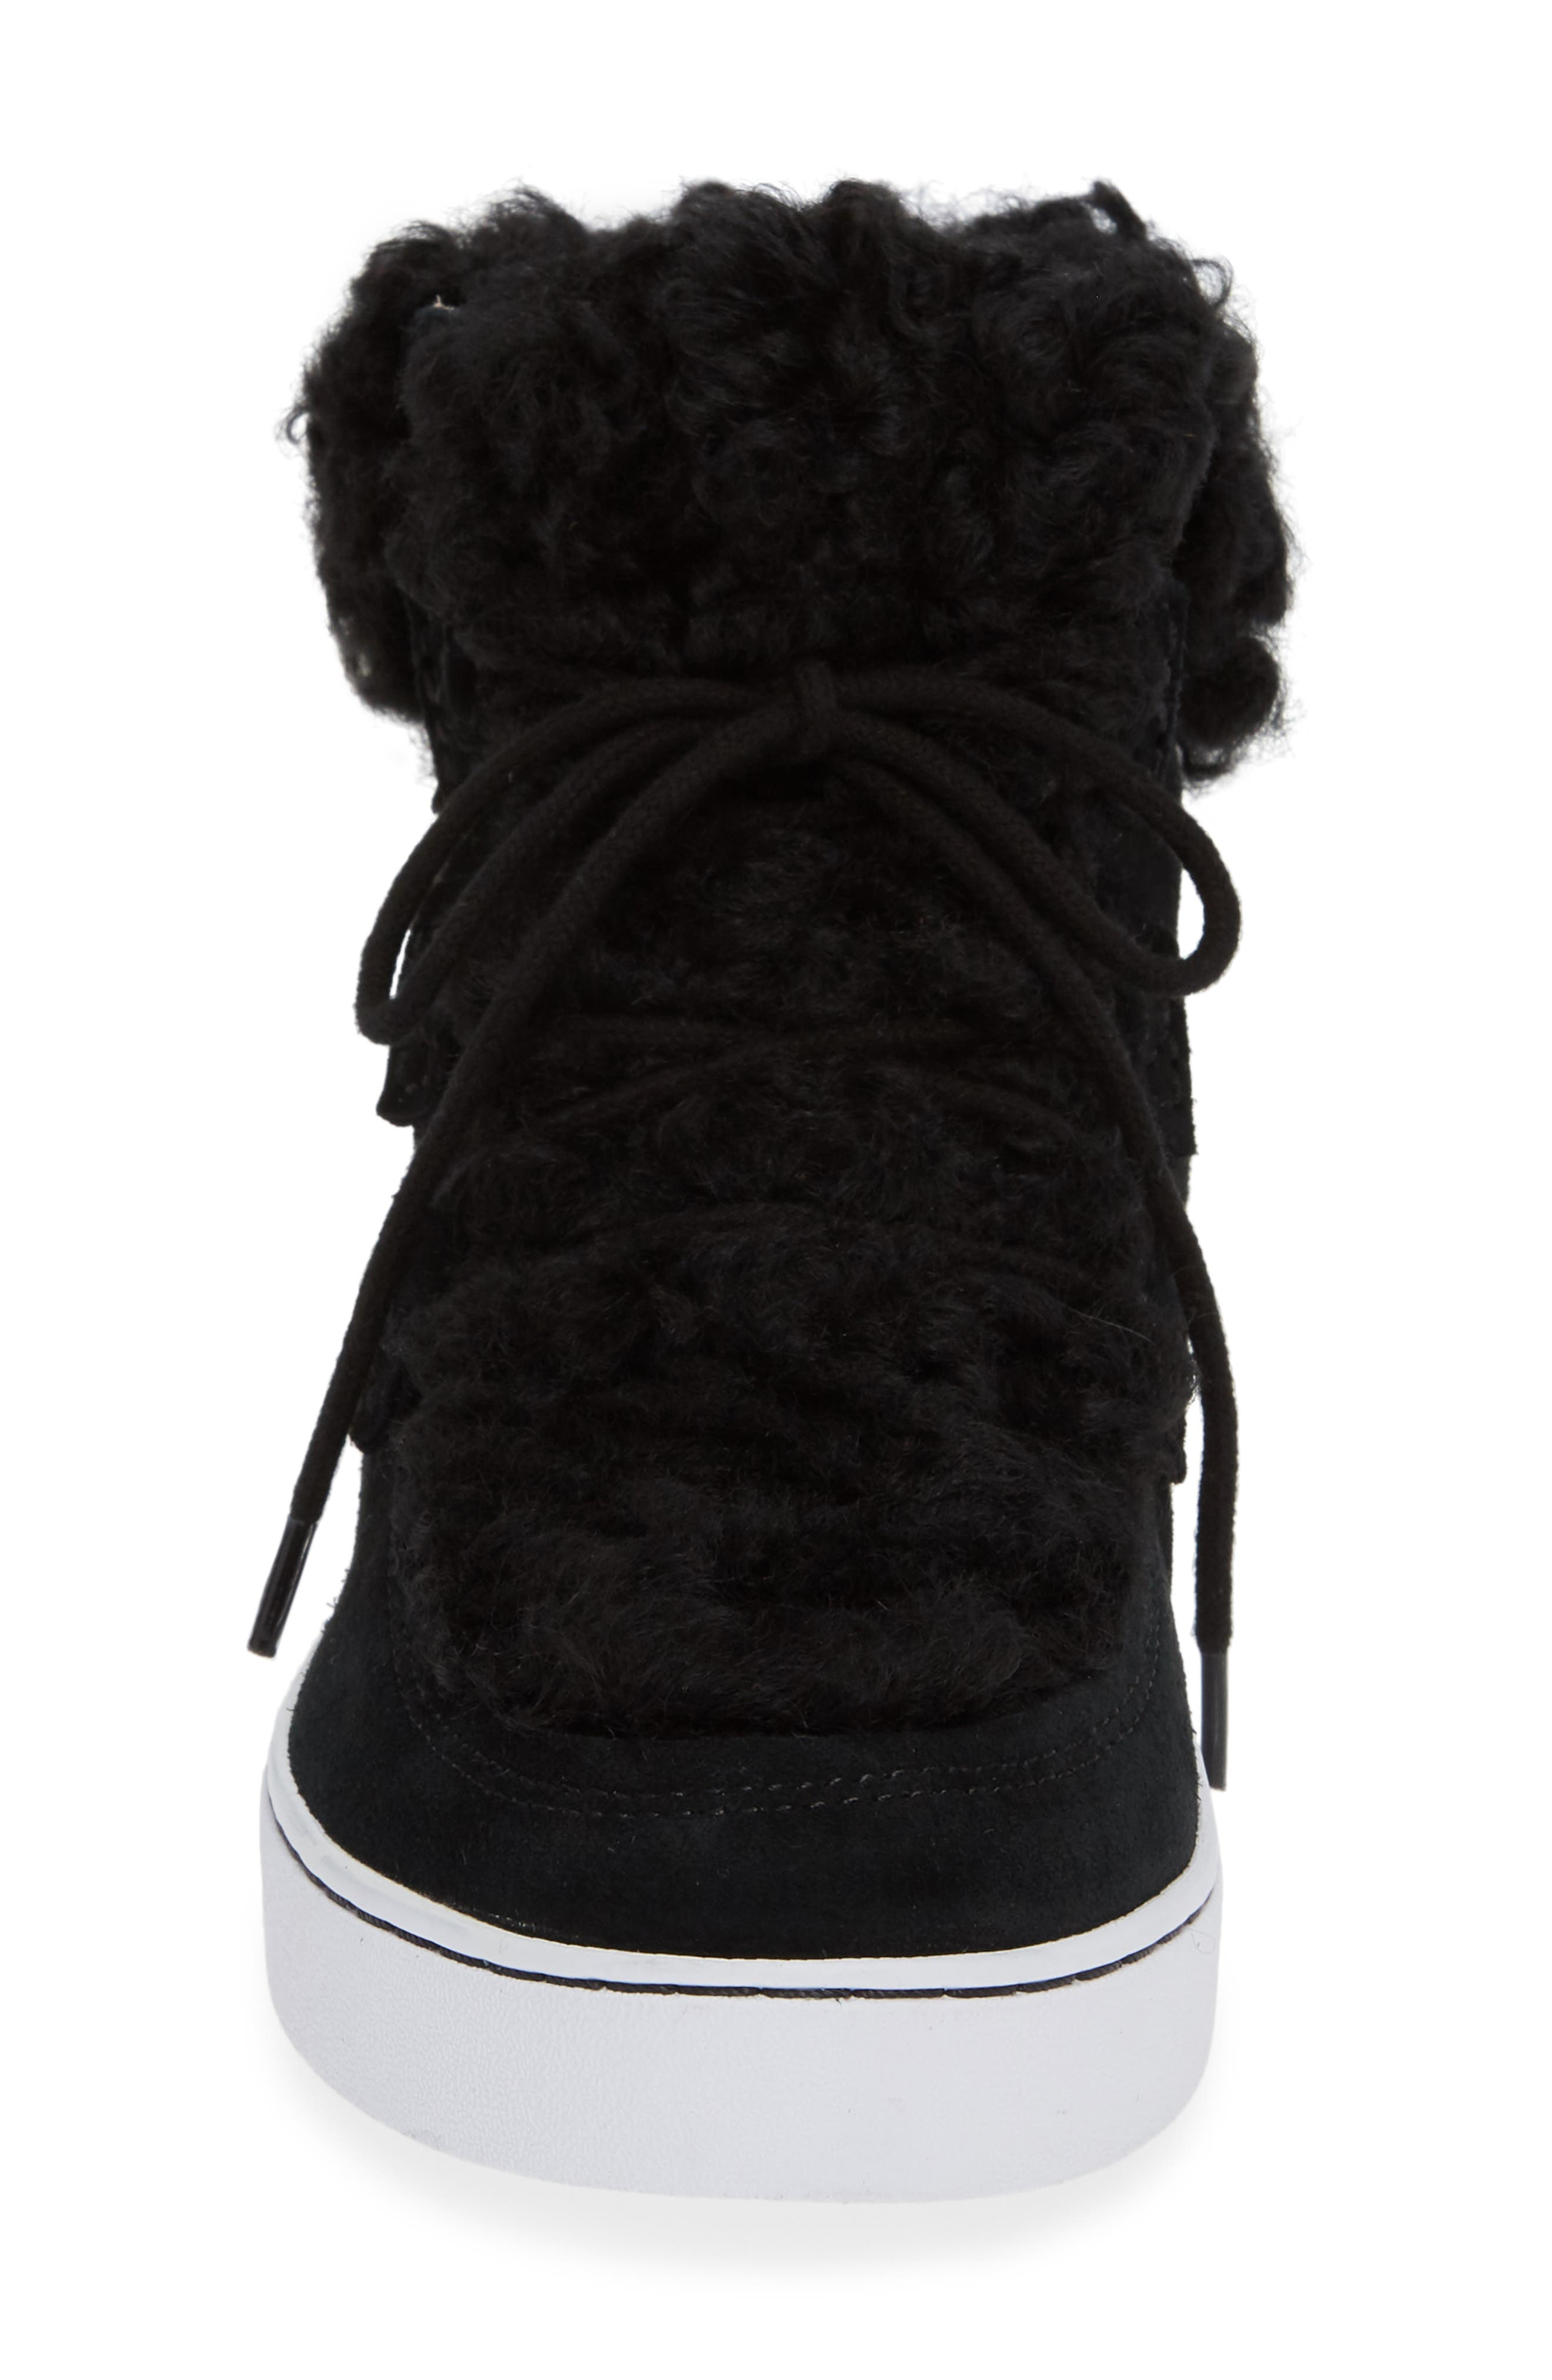 Oak Genuine Shearling Cuff Sneaker Bootie,                             Alternate thumbnail 4, color,                             BLACK SUEDE